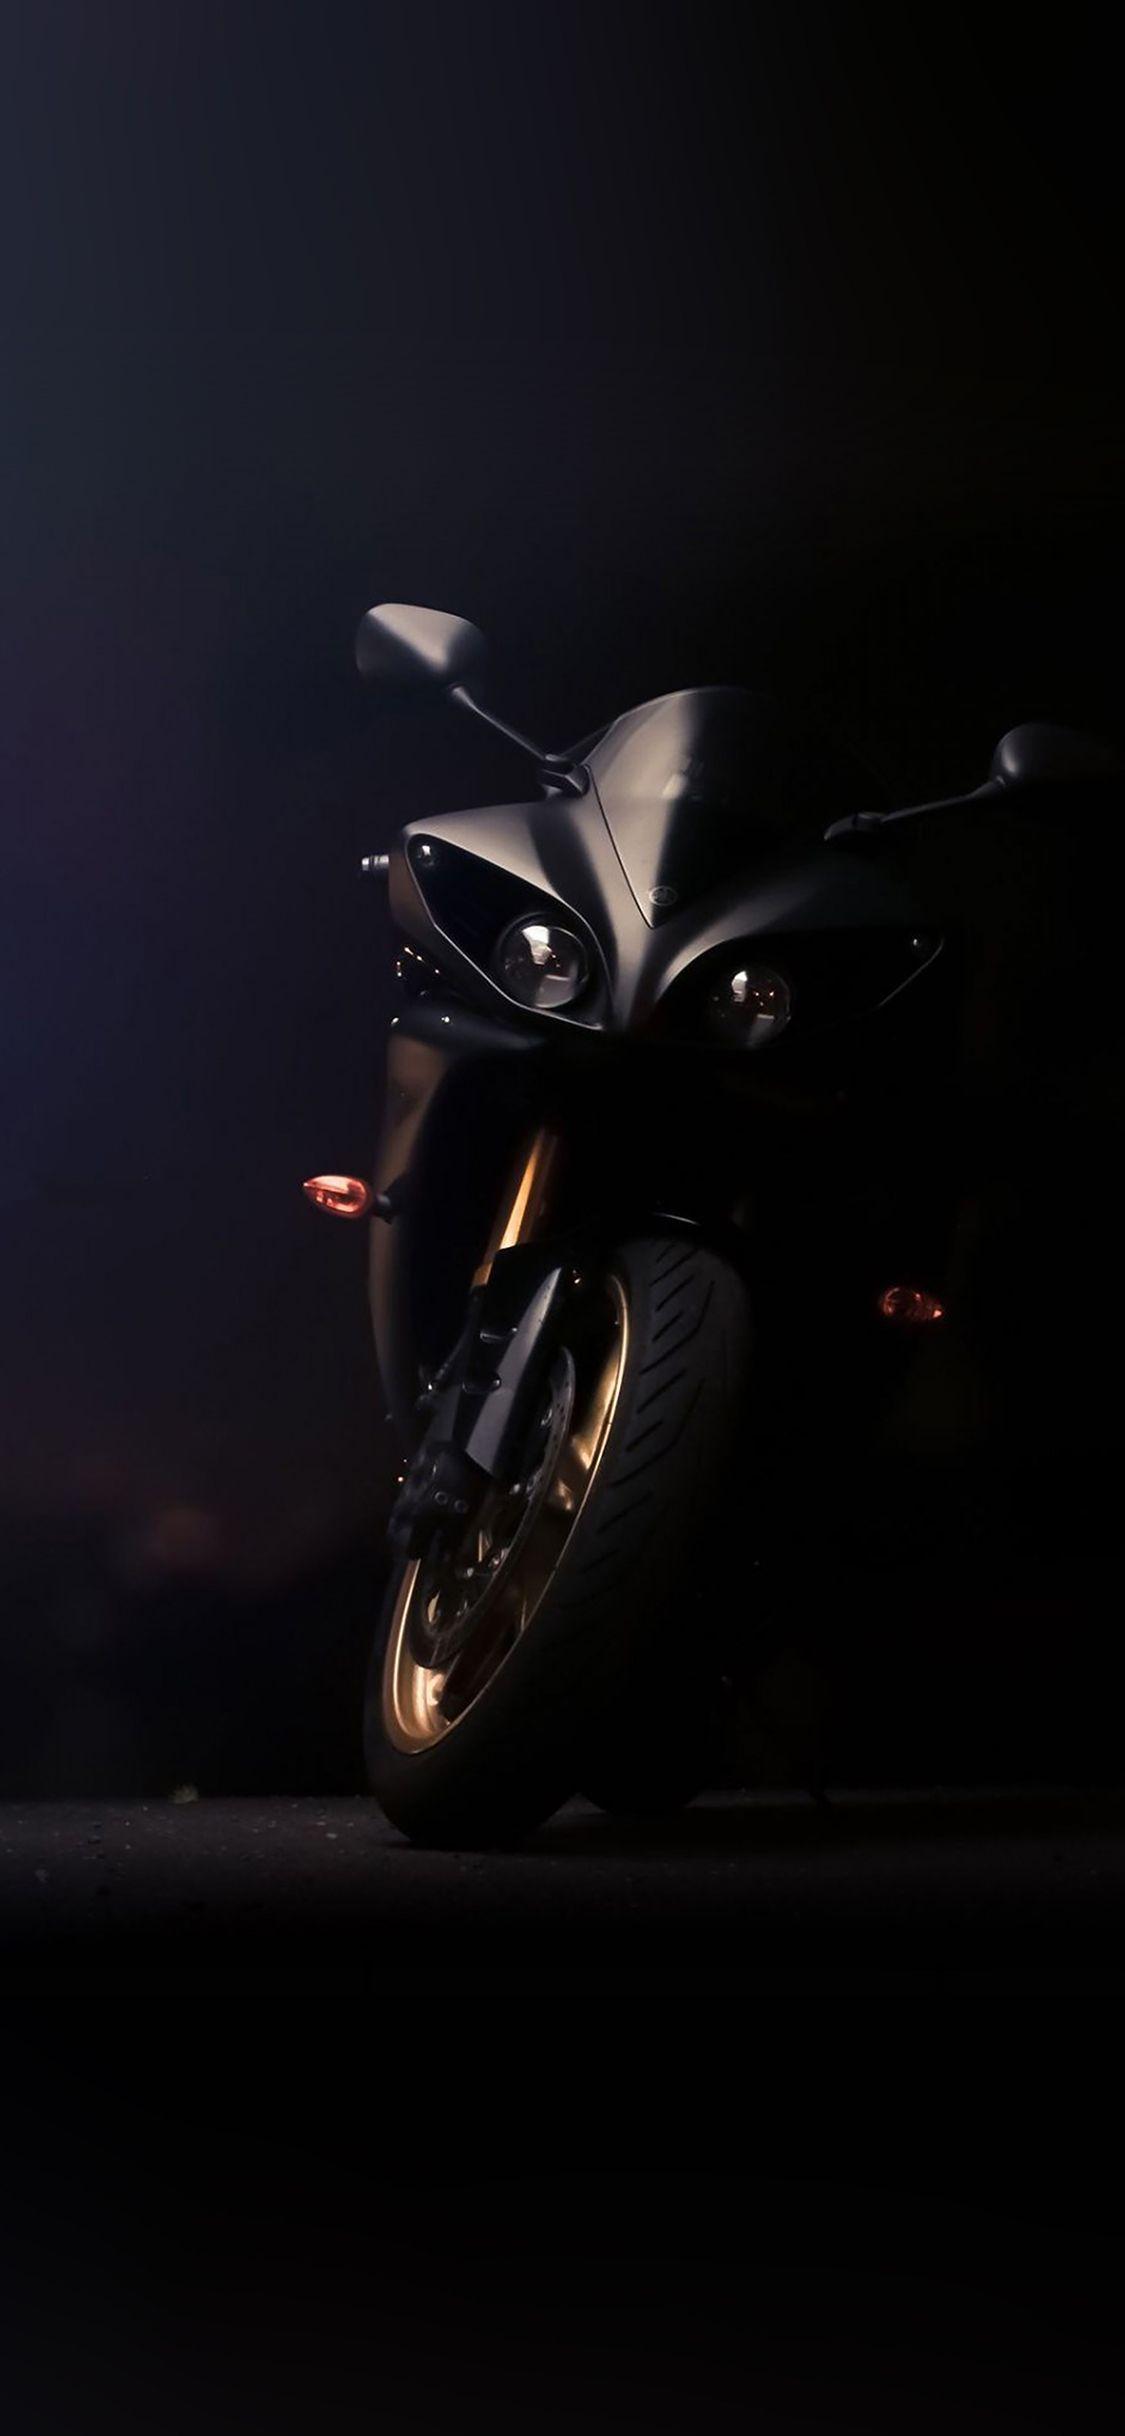 Yamaha Ride Motorbike In 2020 Motorcycle Wallpaper Moto Wallpapers Yamaha Bikes